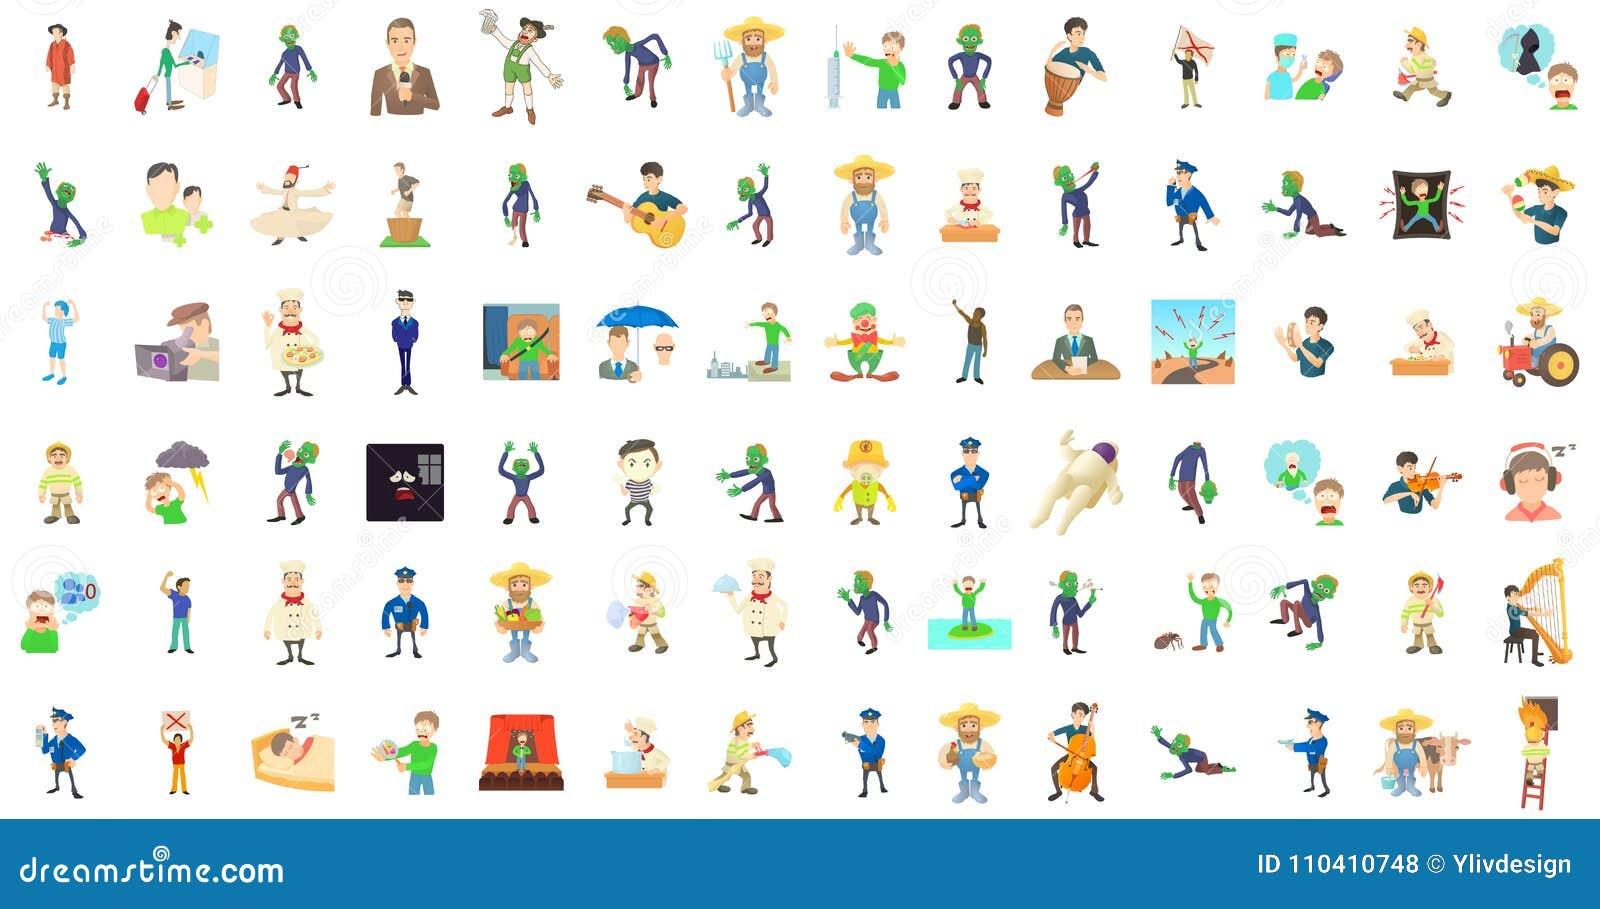 Men characters icon set, cartoon style